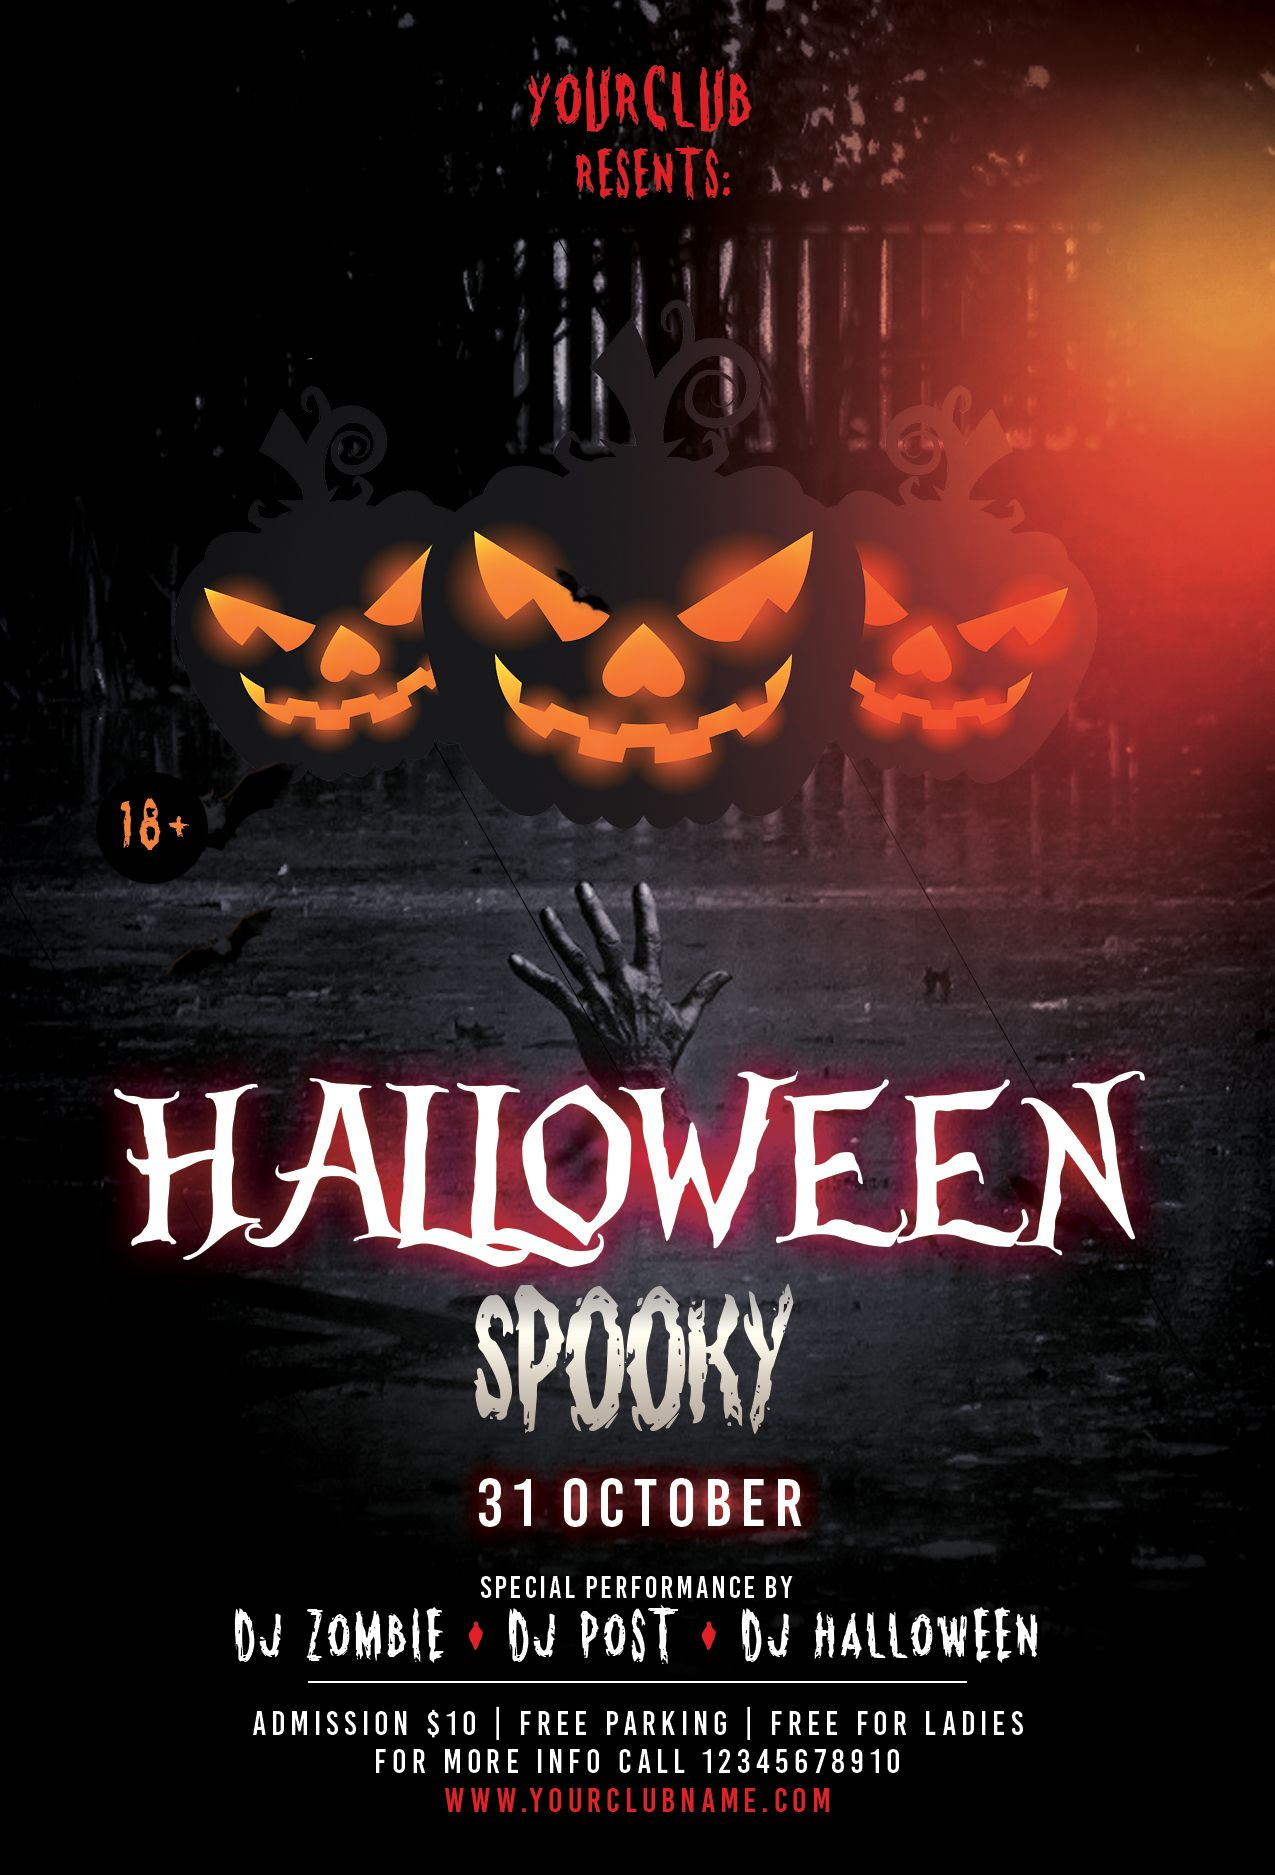 Halloween Spooky Download Free Psd Flyer Template Pixelsdesign Halloween Party Flyer Halloween Flyer Spooky Halloween Party